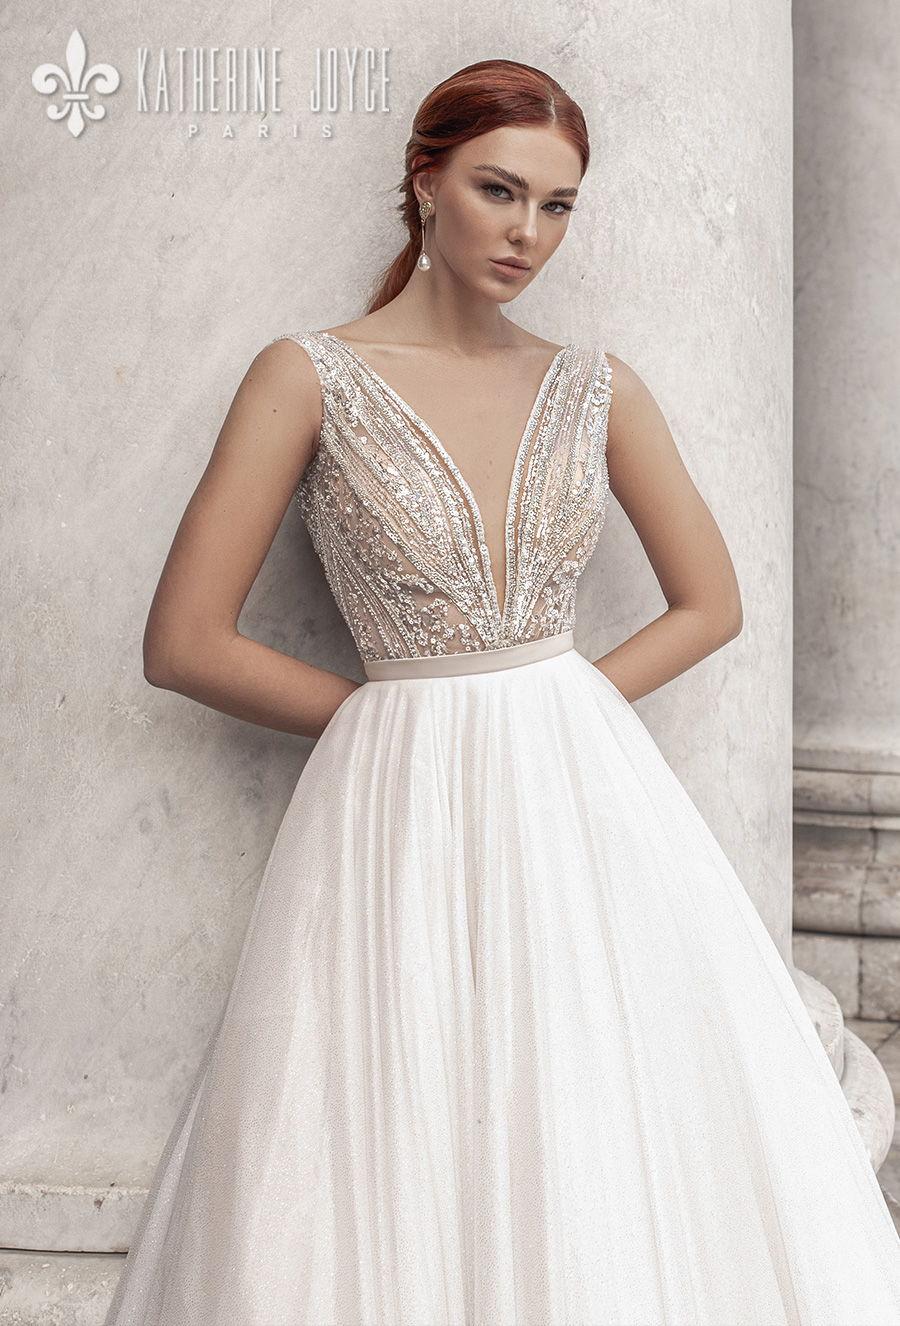 katherine joyce 2021 naples bridal sleeveless deep v neck heavily embellished bodice romantic a line wedding dress v back chapel train (calipso) zv